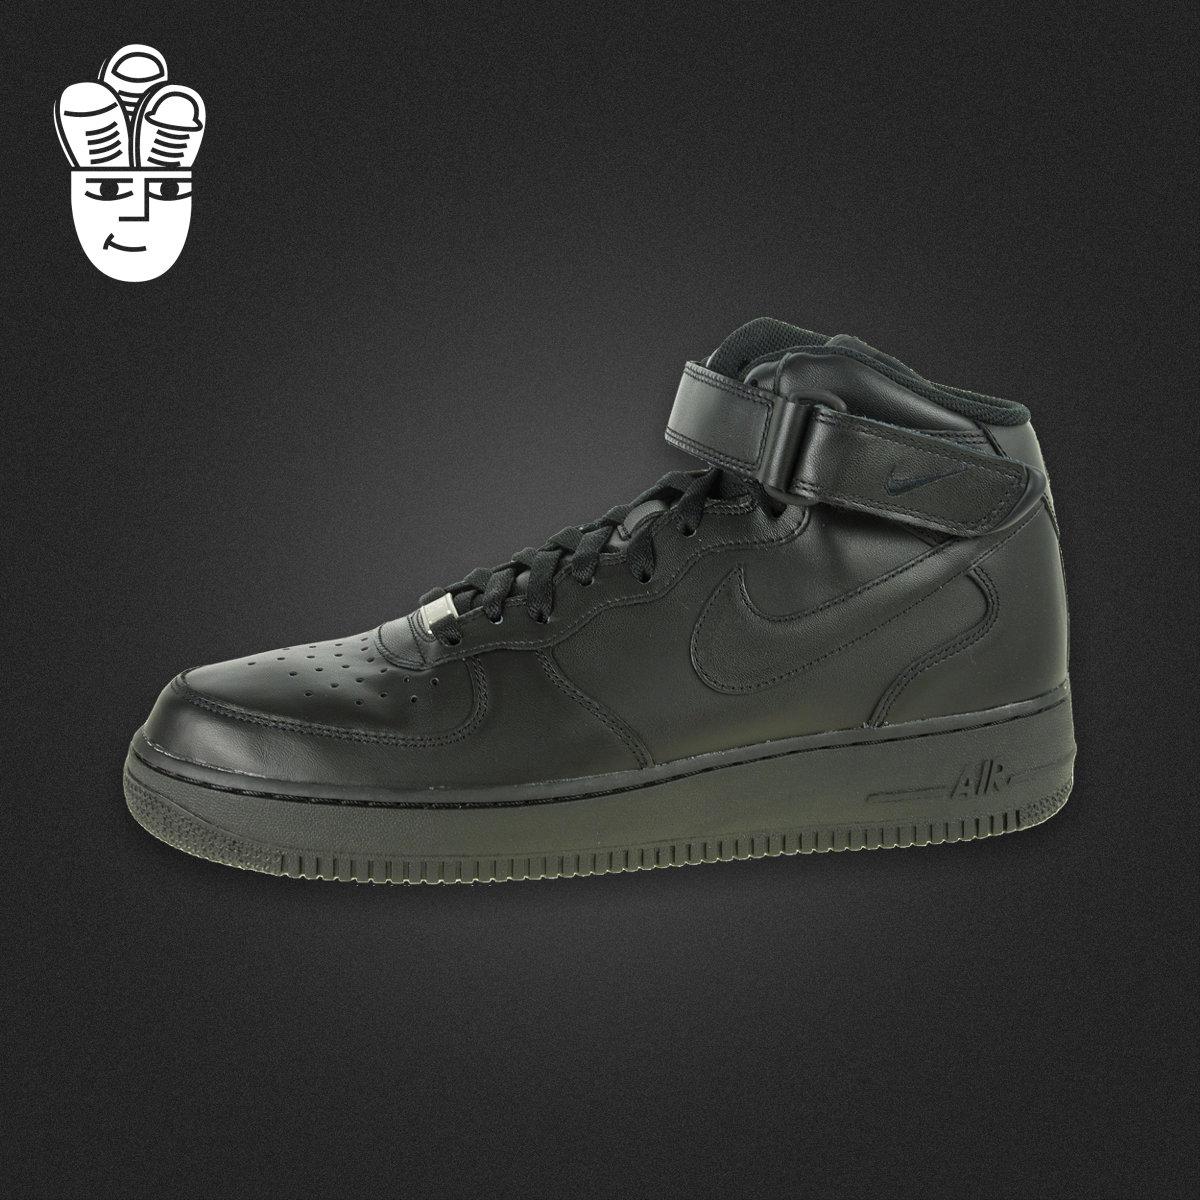 Nike Air Force 1 Mid '07 耐克 男鞋 中帮气垫板鞋 休闲鞋